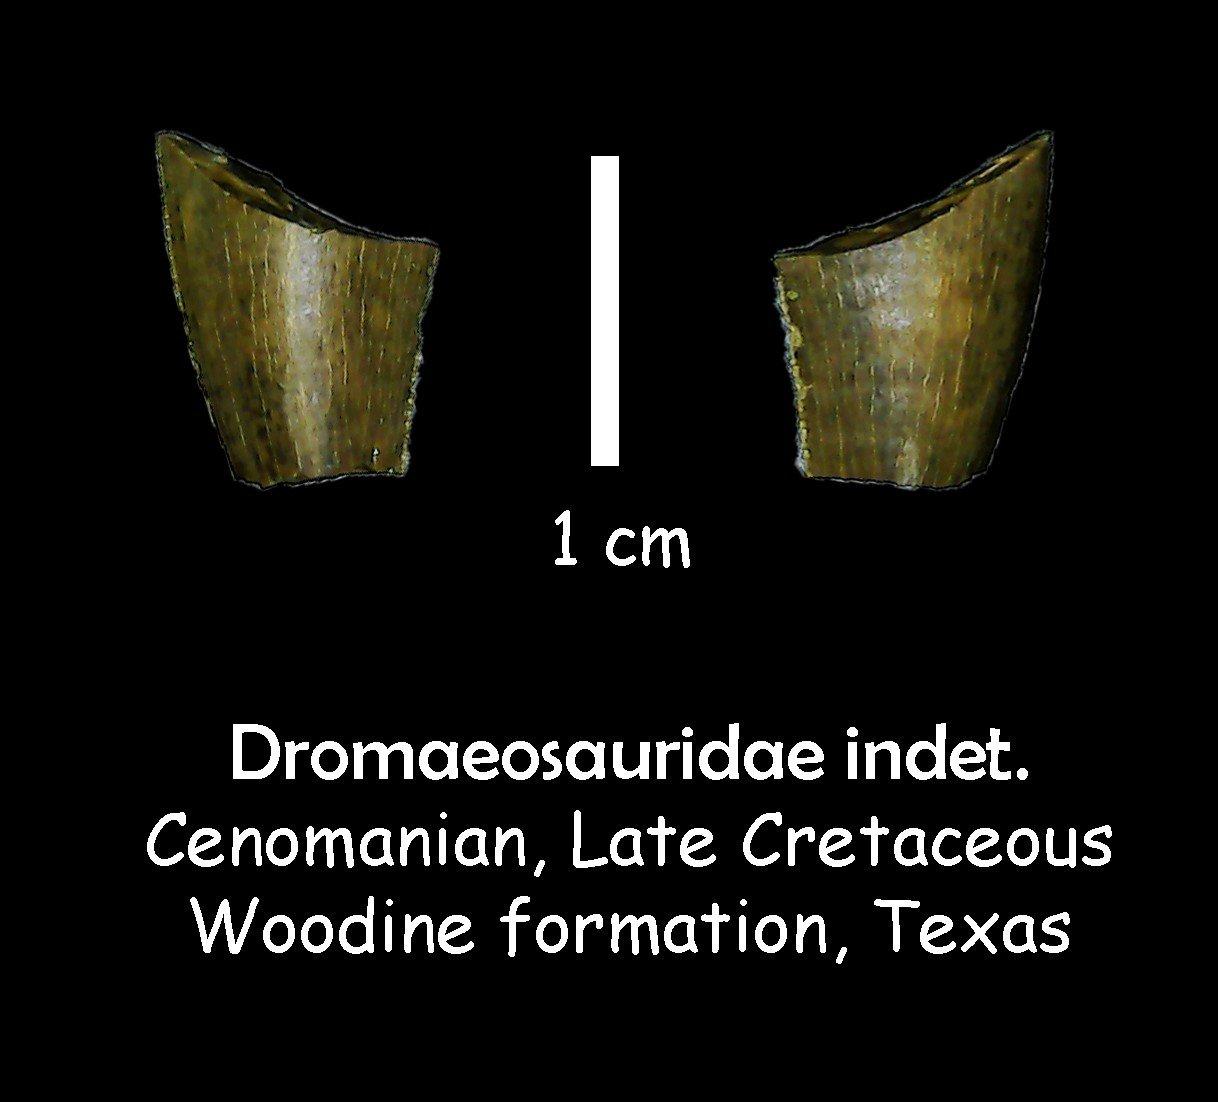 Woodbine formation Dromaeosaurid